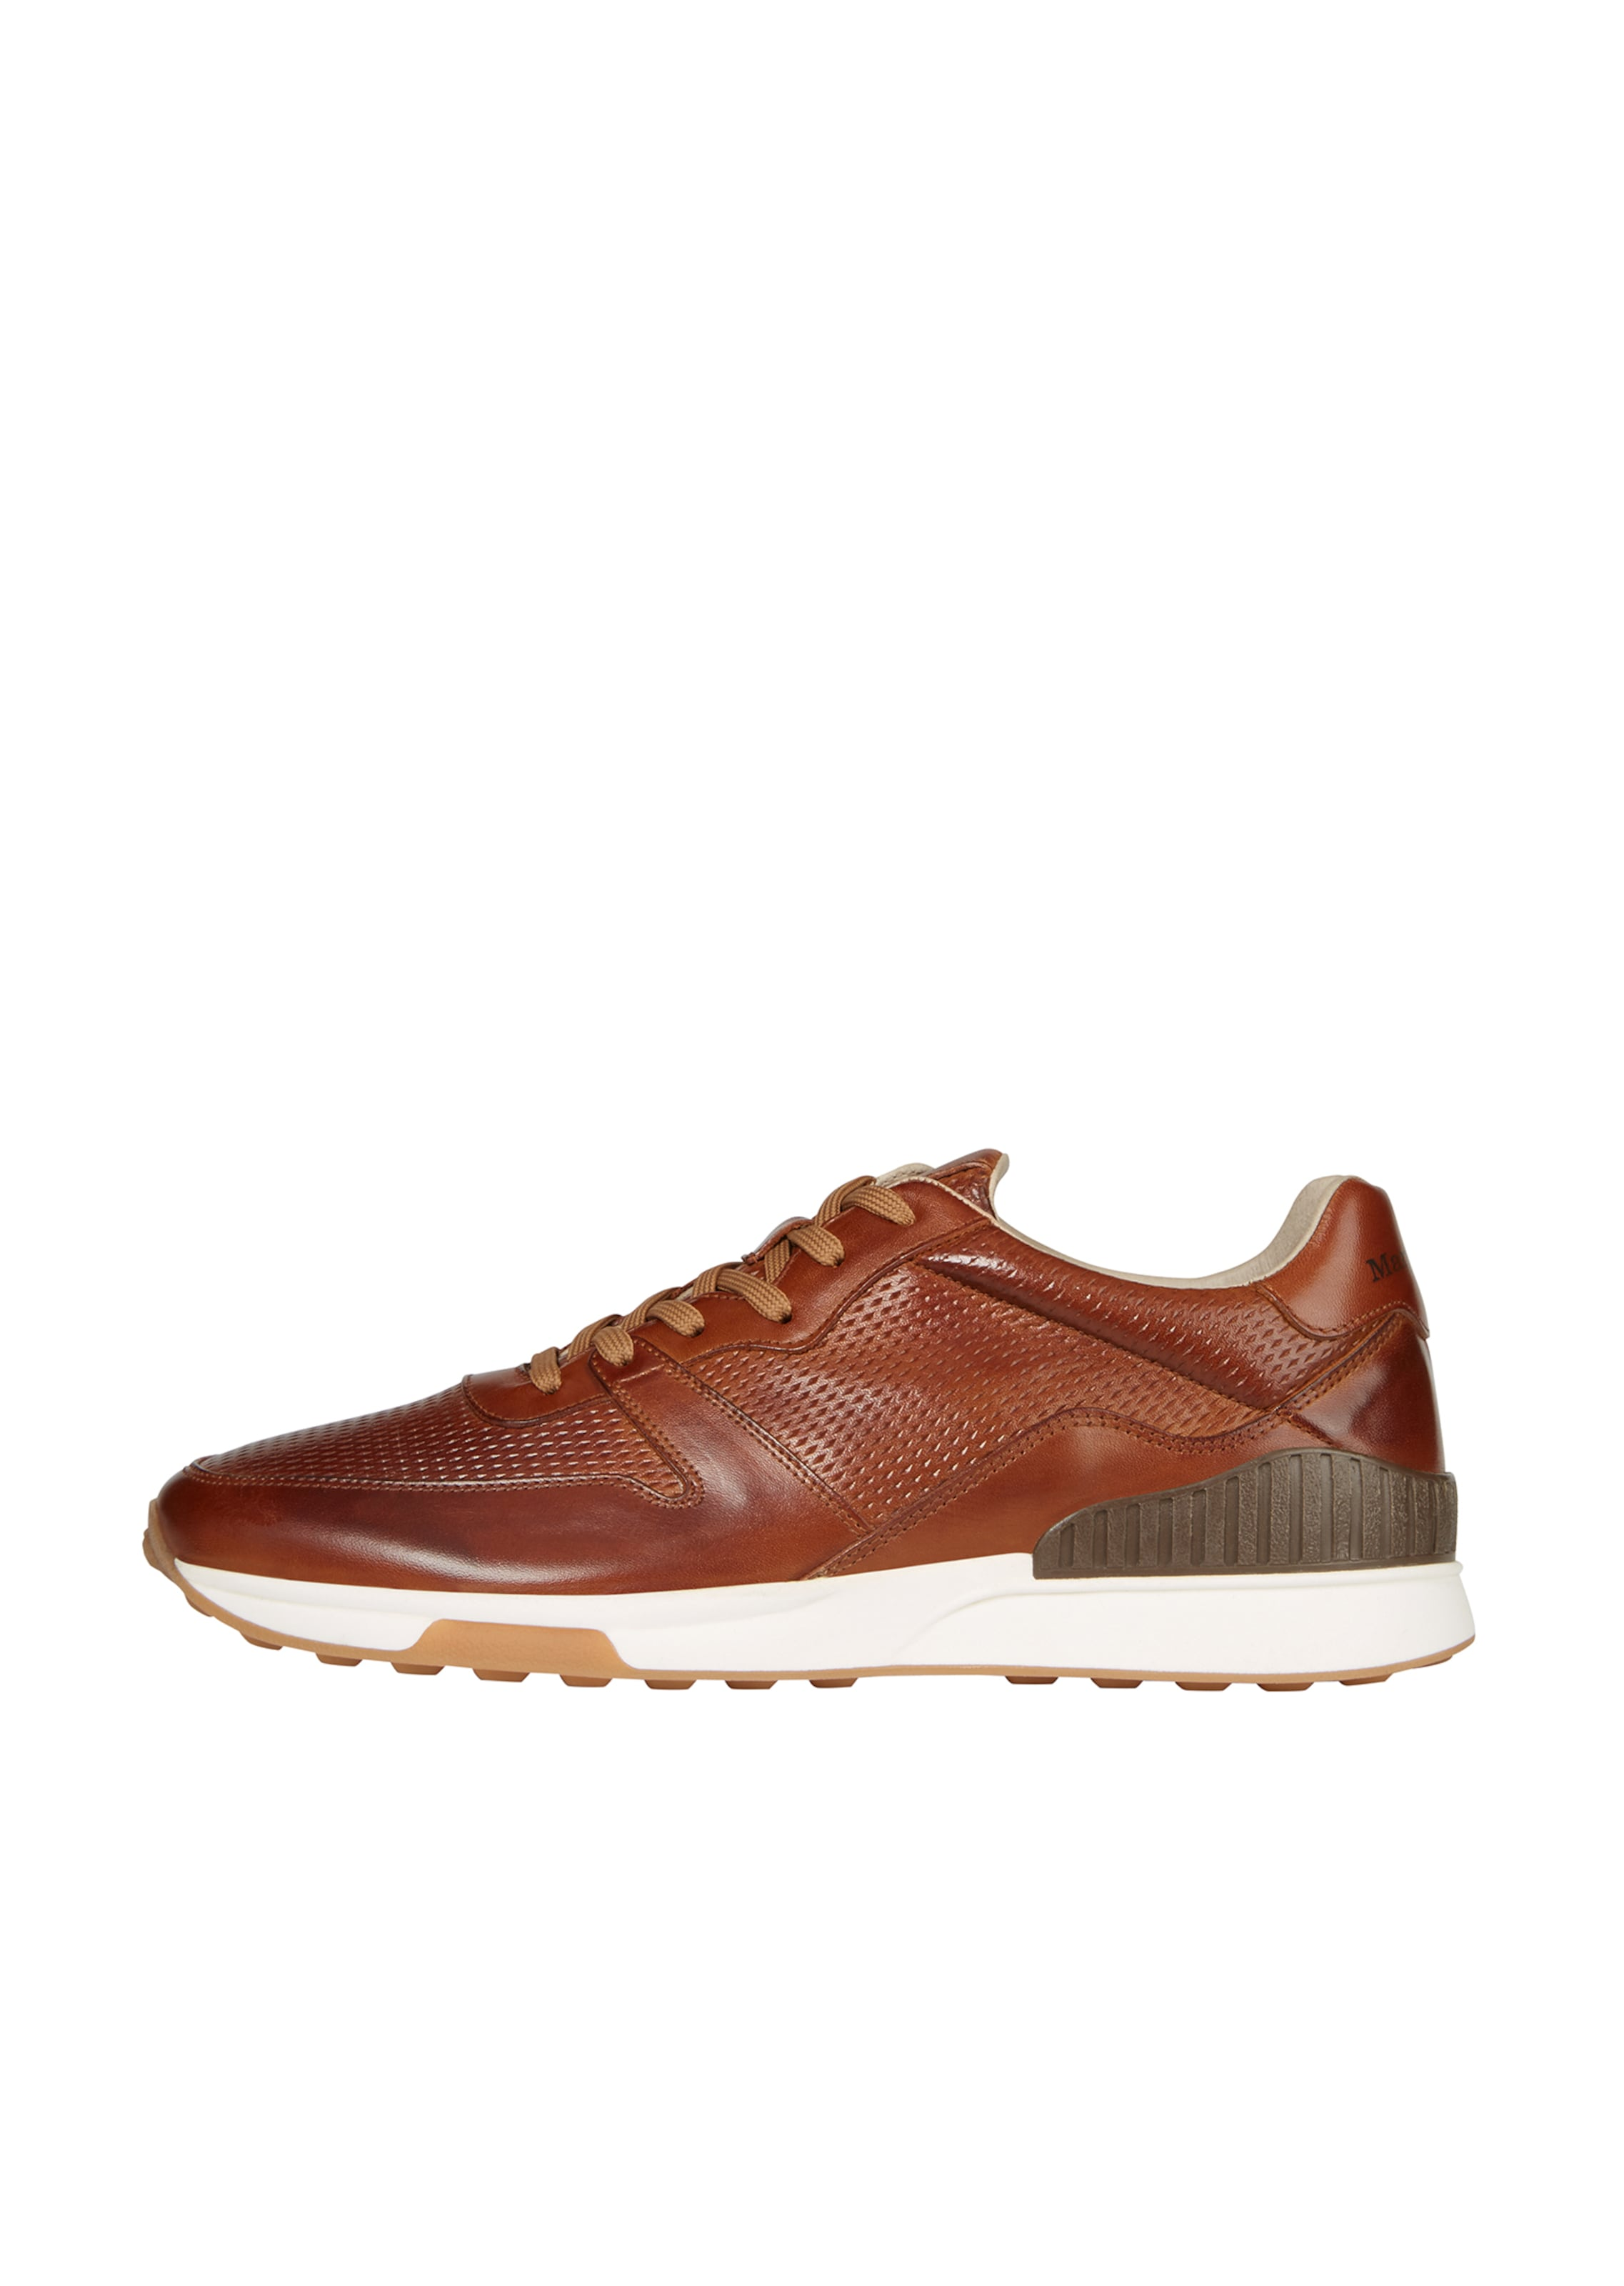 Haltbare Mode billige Schuhe Marc O'Polo   Sneaker Schuhe Gut getragene Schuhe